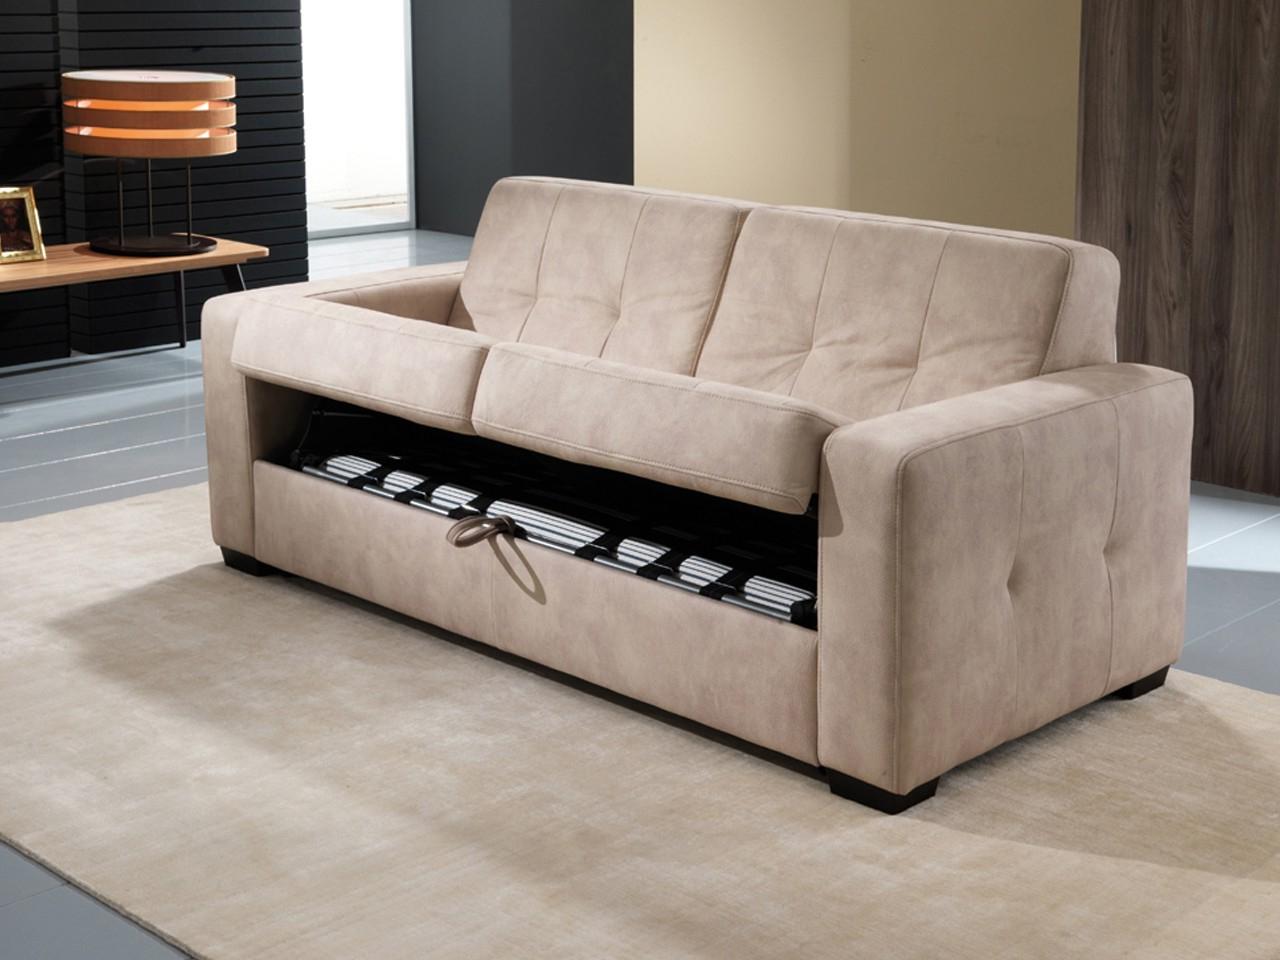 Dicoro sofas Cama Zwdg Affascinante Prar sofa Cama Barato Y sofas Dicoro